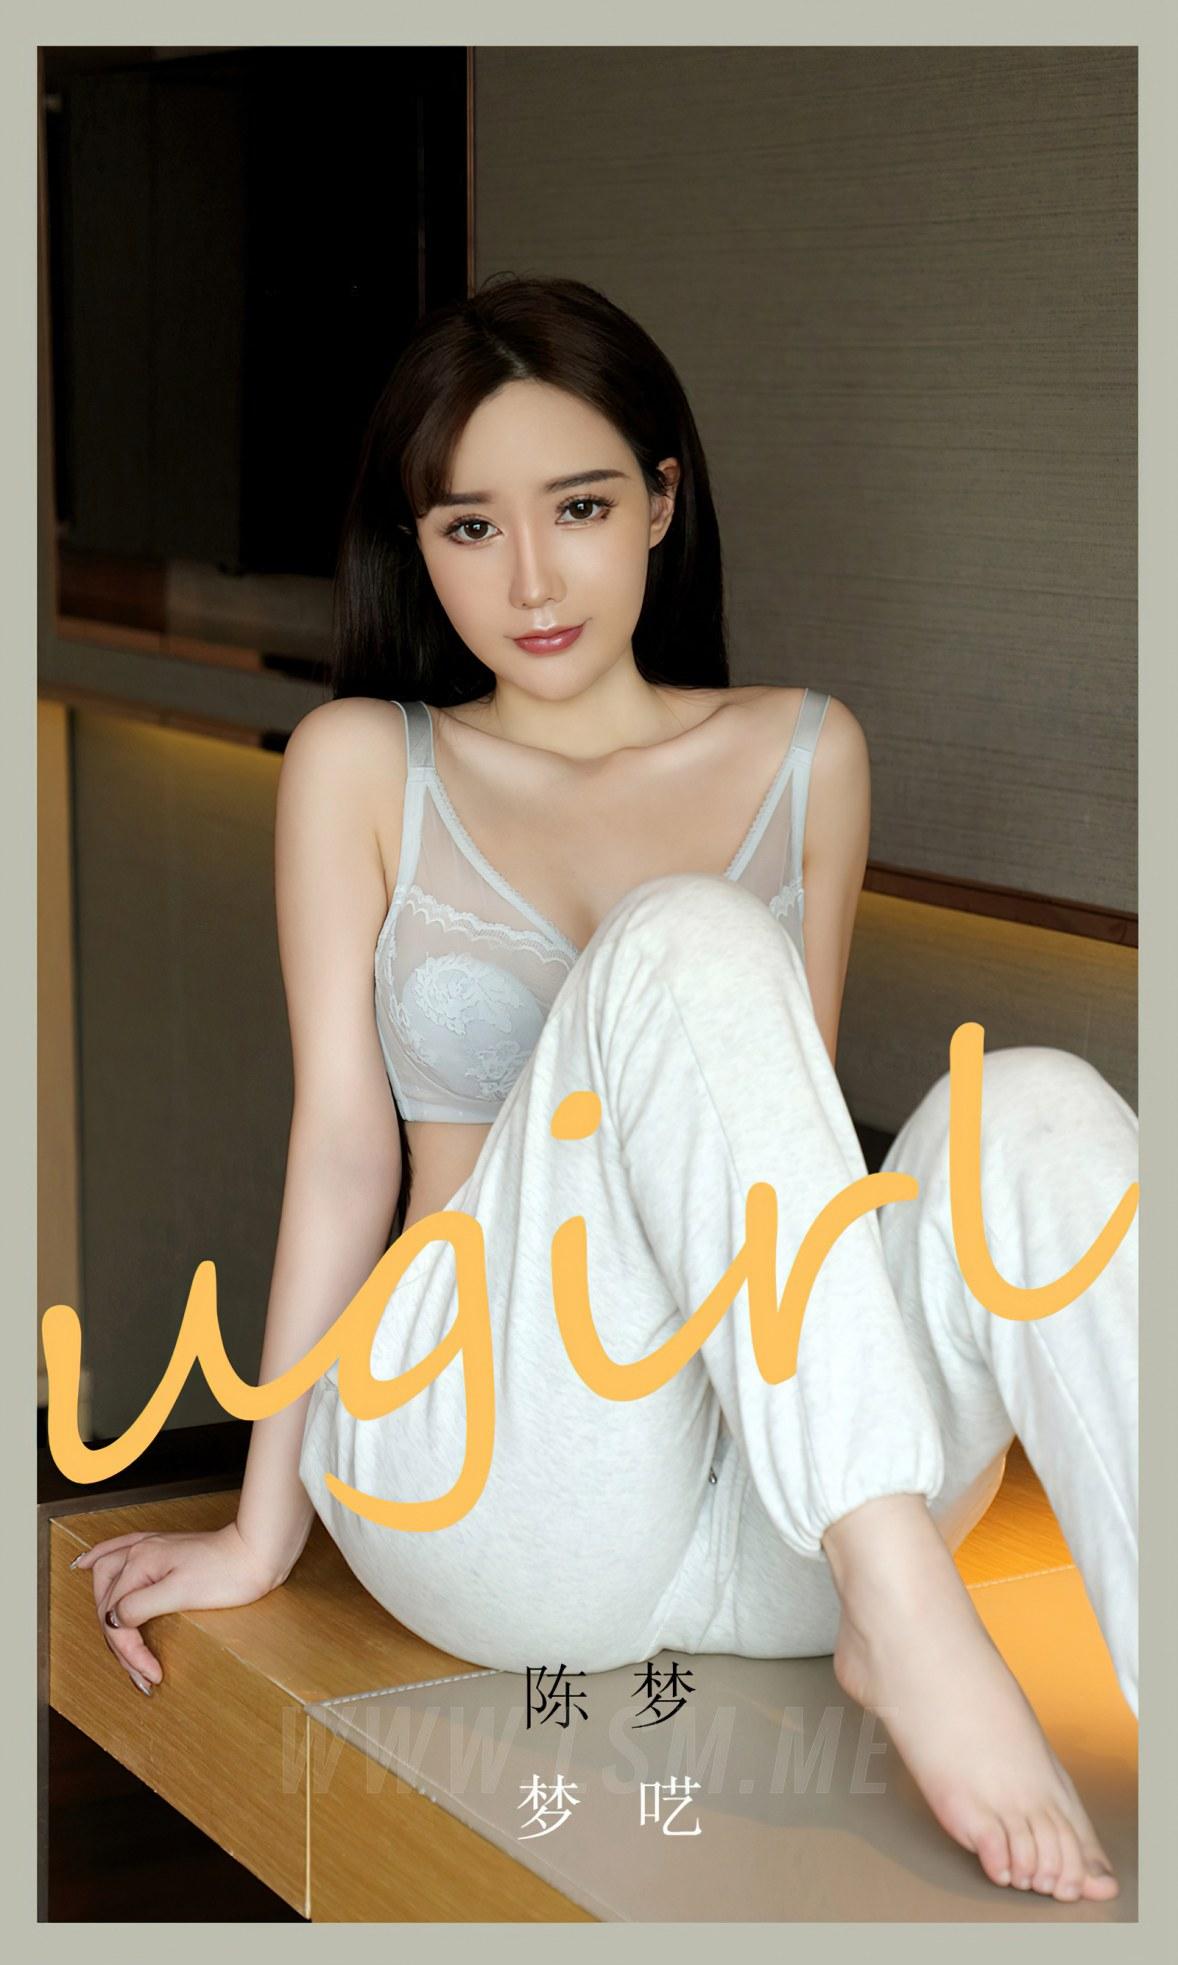 UGirls 爱尤物 No.2099 陈梦 梦呓 - 1